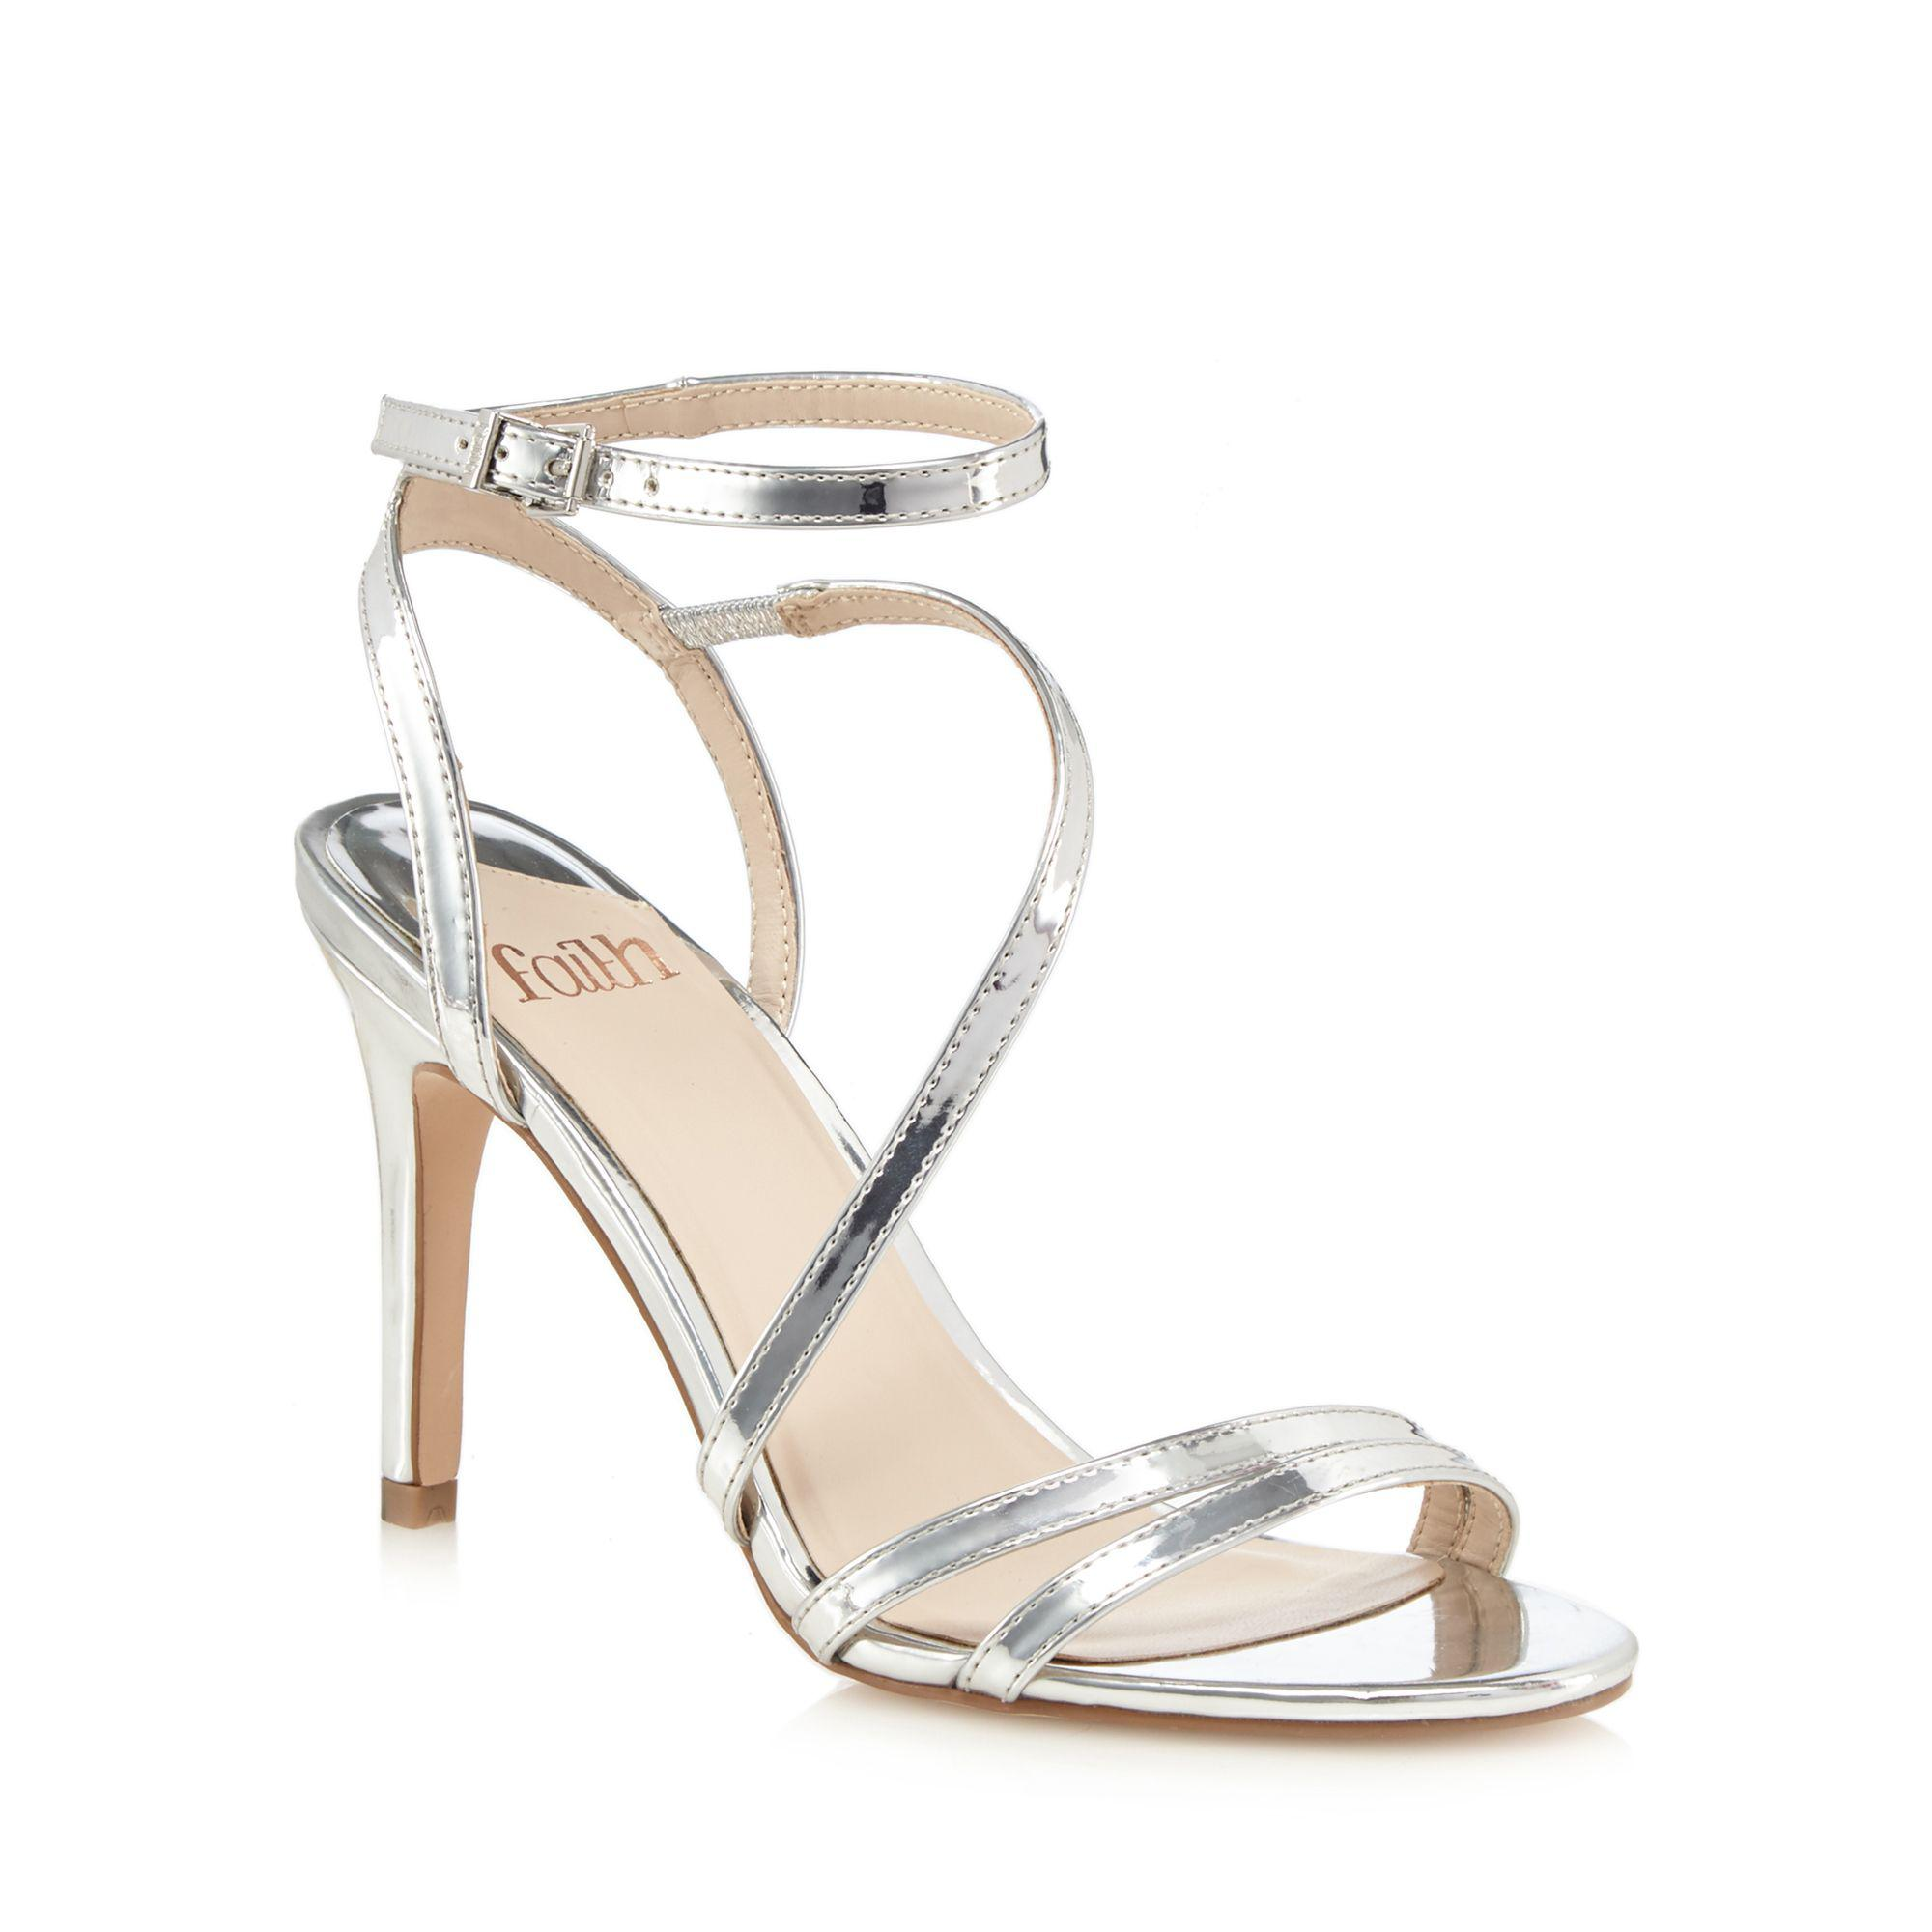 a717b6d9b Faith - Metallic Silver  delly  High Stiletto Heel Ankle Strap Sandals -  Lyst. View fullscreen